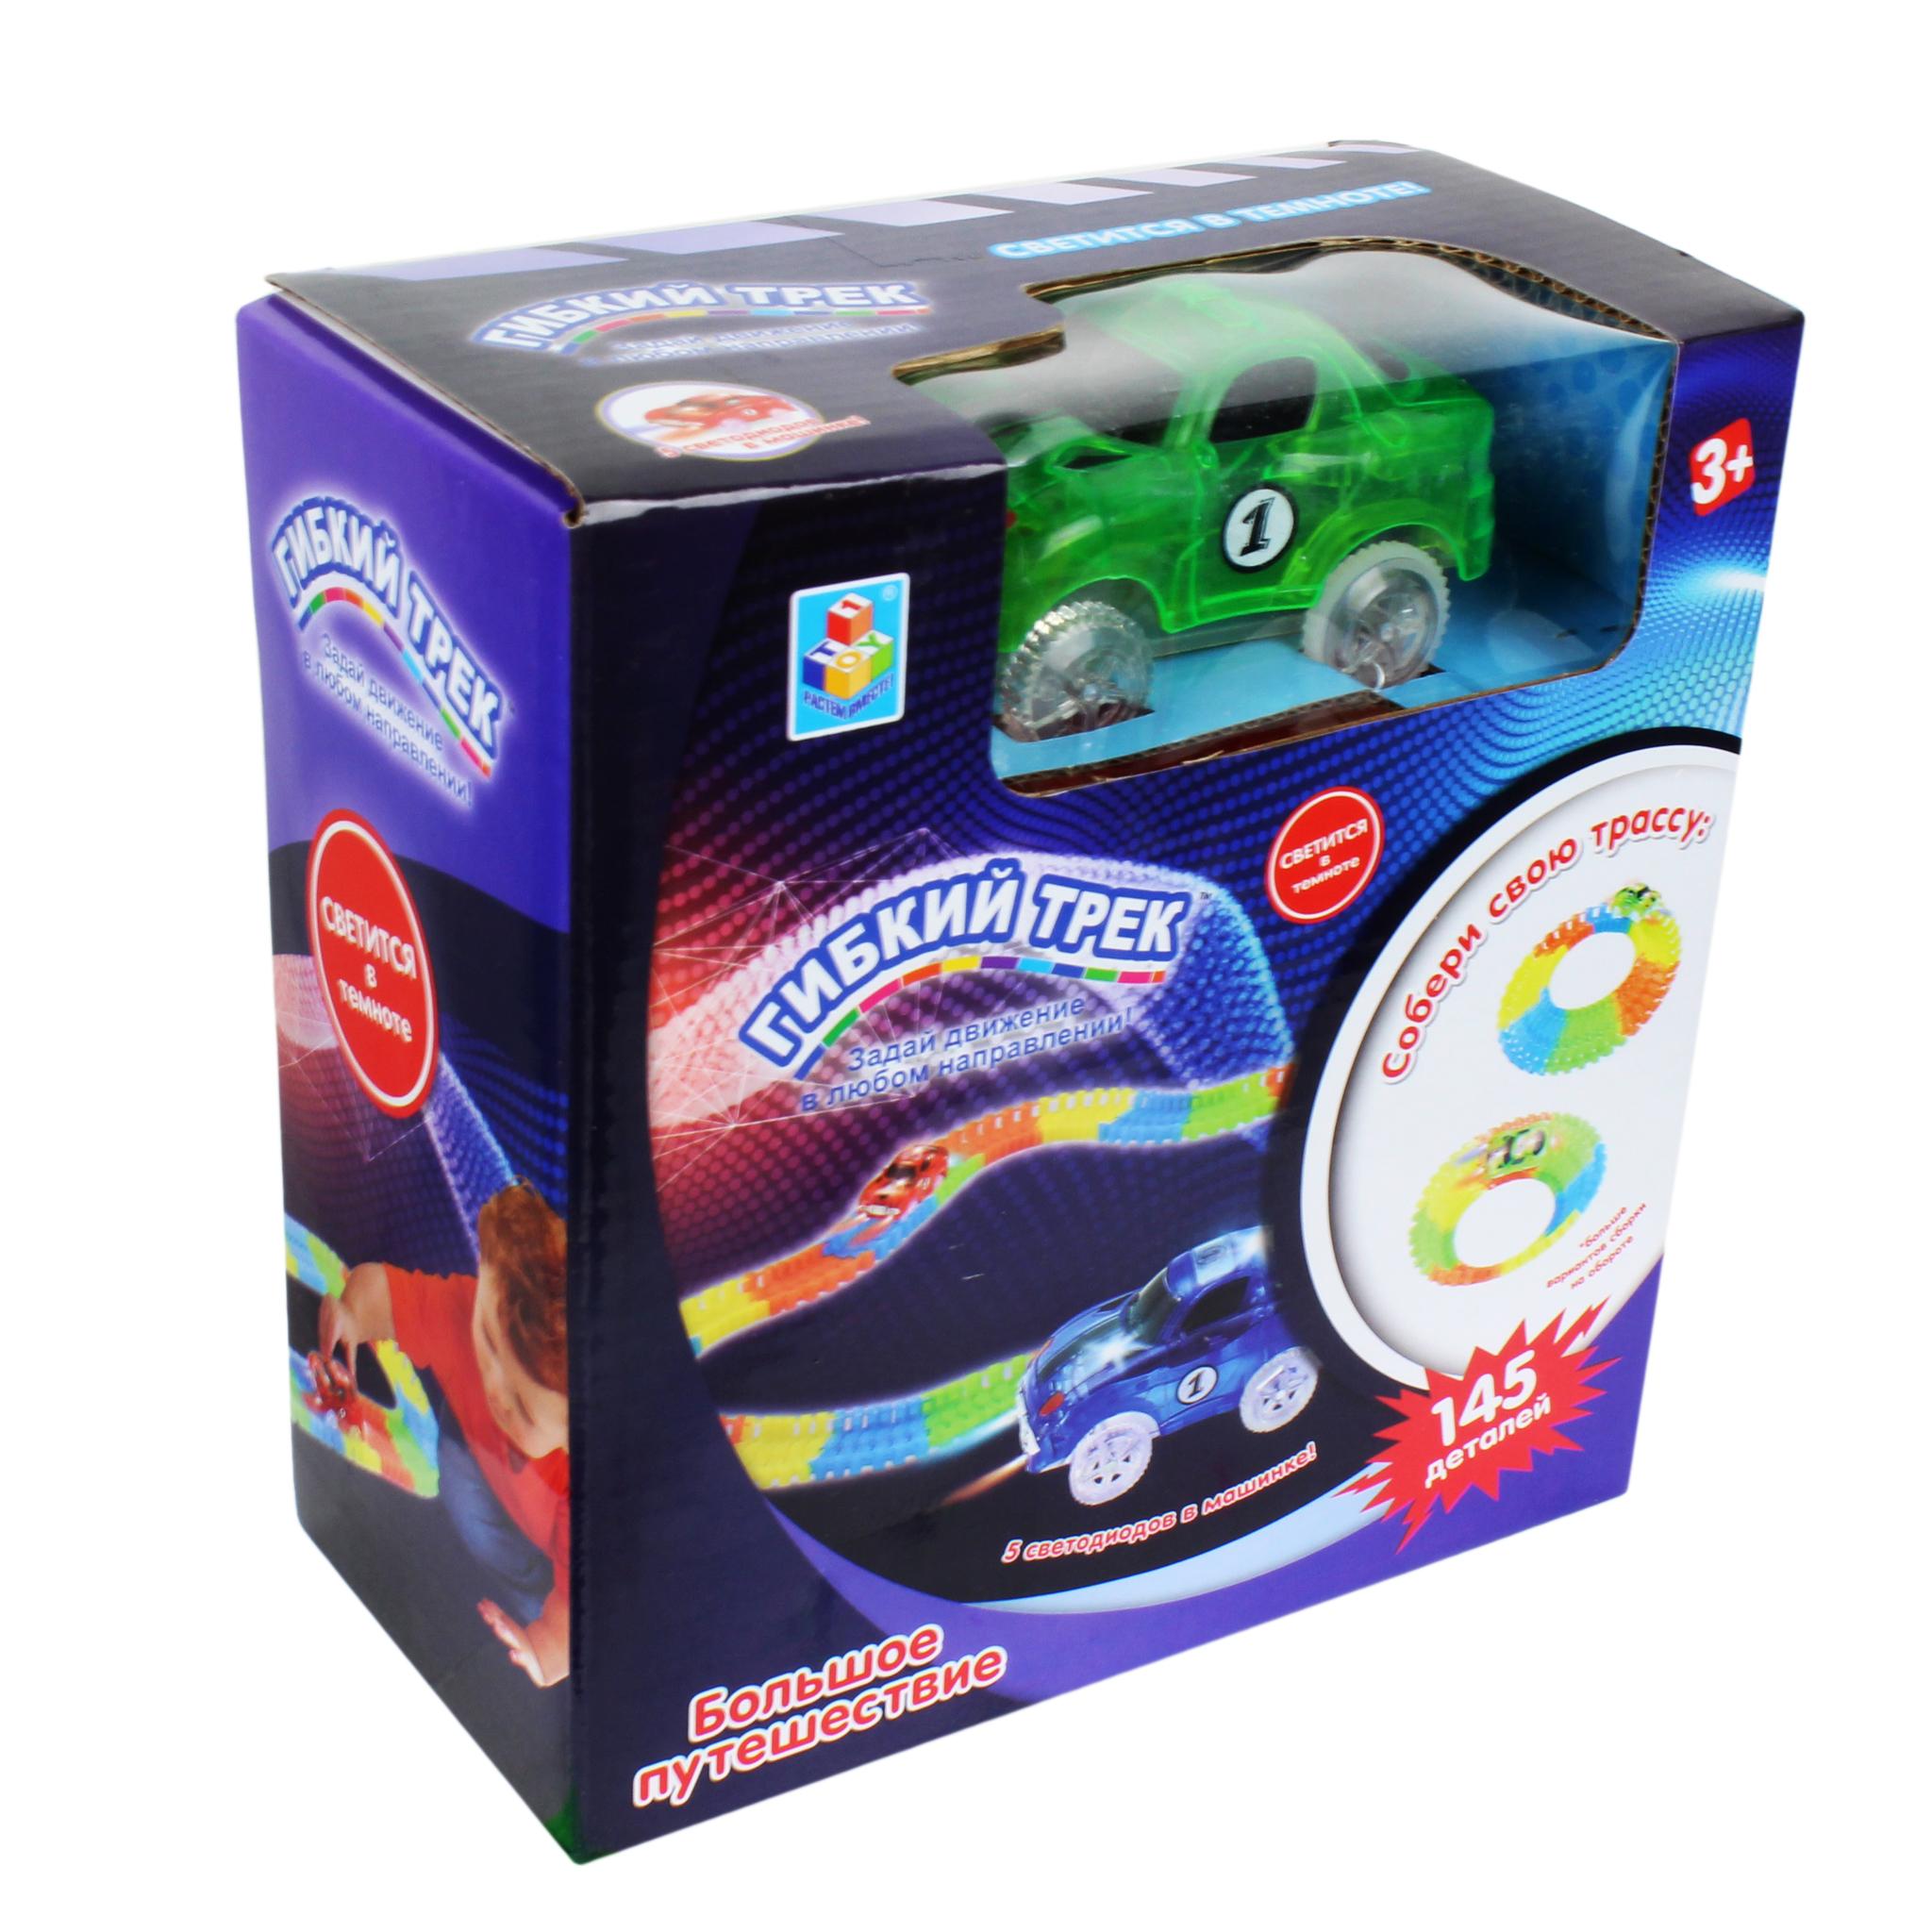 Светящийся гибкий трек 1 Toy